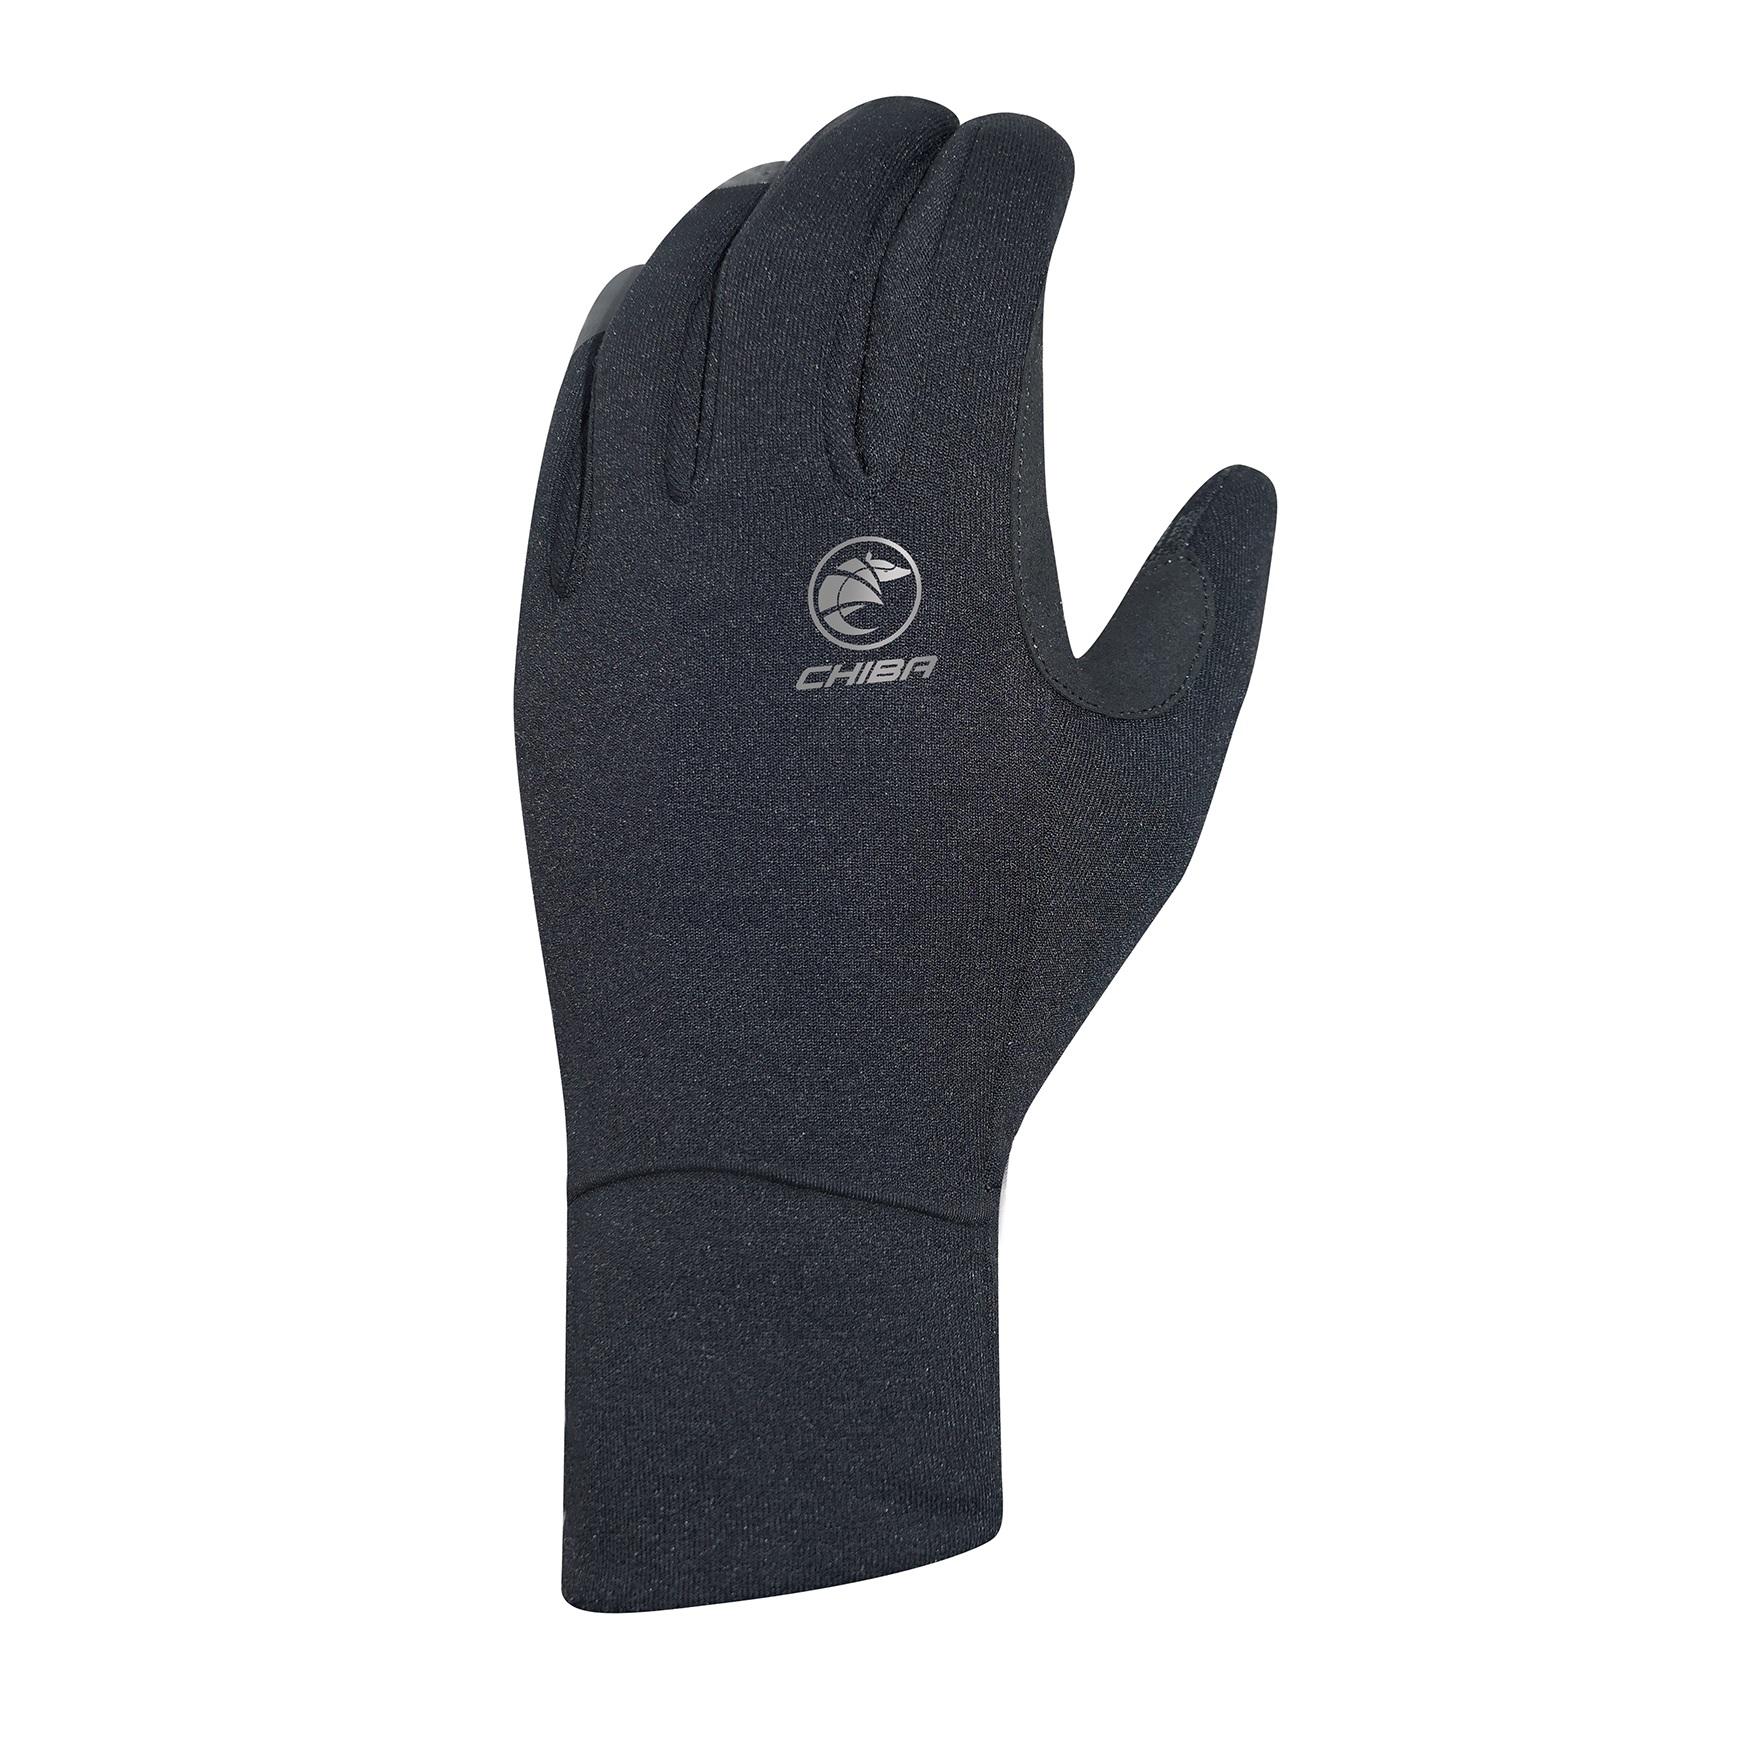 Picture of Chiba Polarfleece Bike Gloves - black